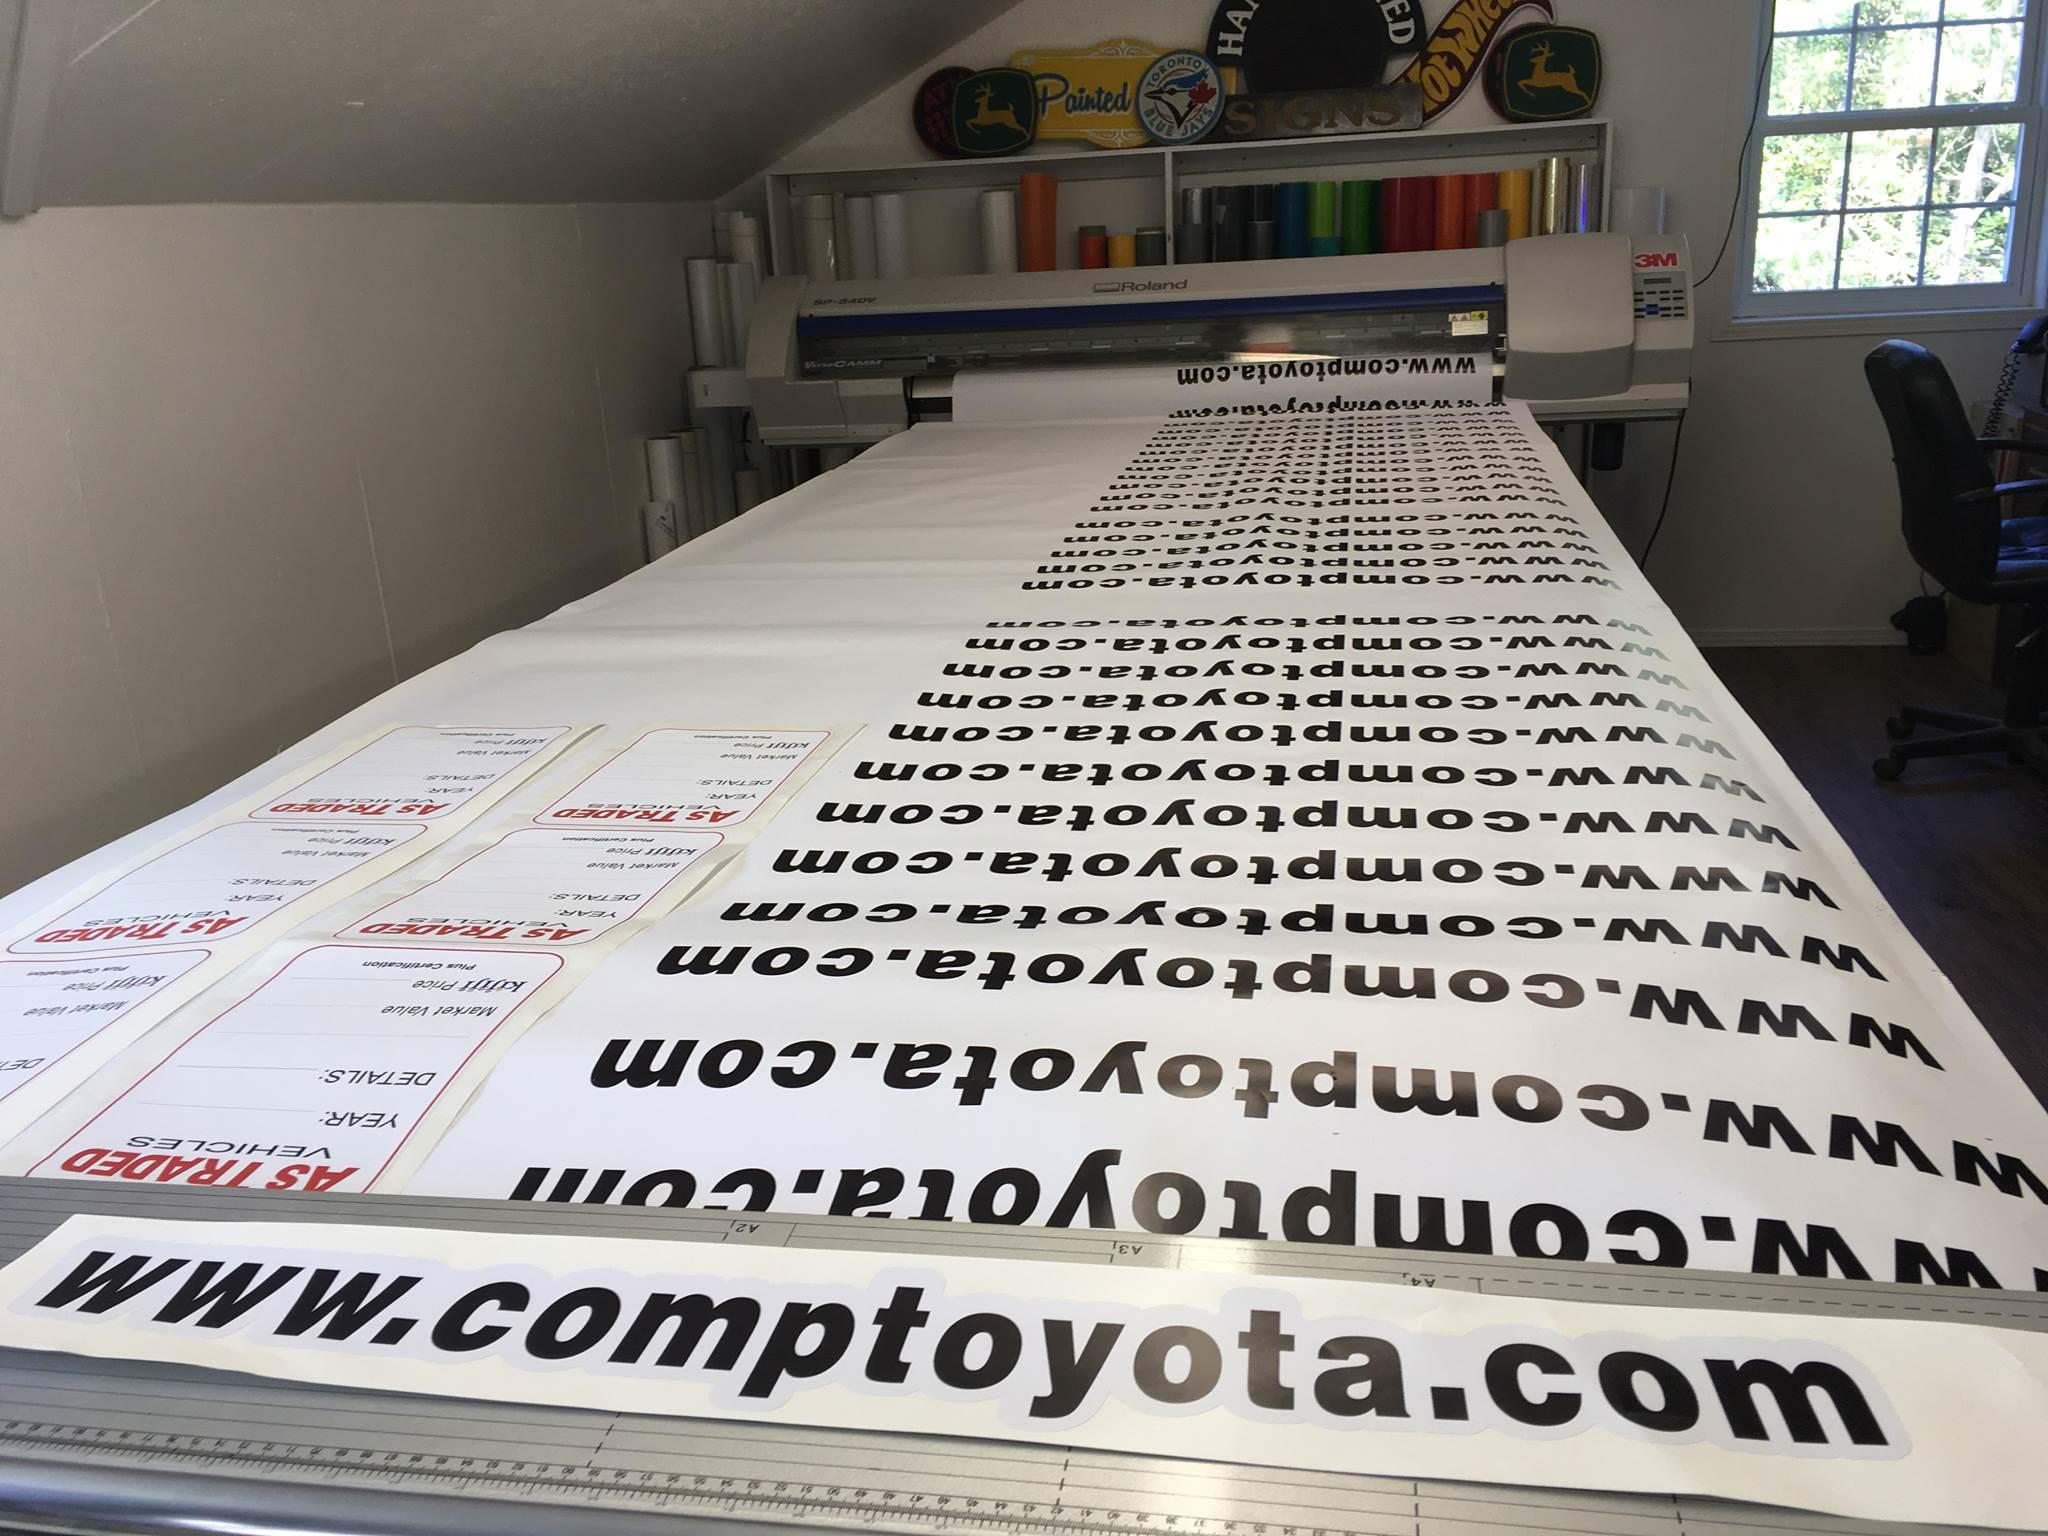 Custom Decal Sicker Printing For Cars Amp Store Windows